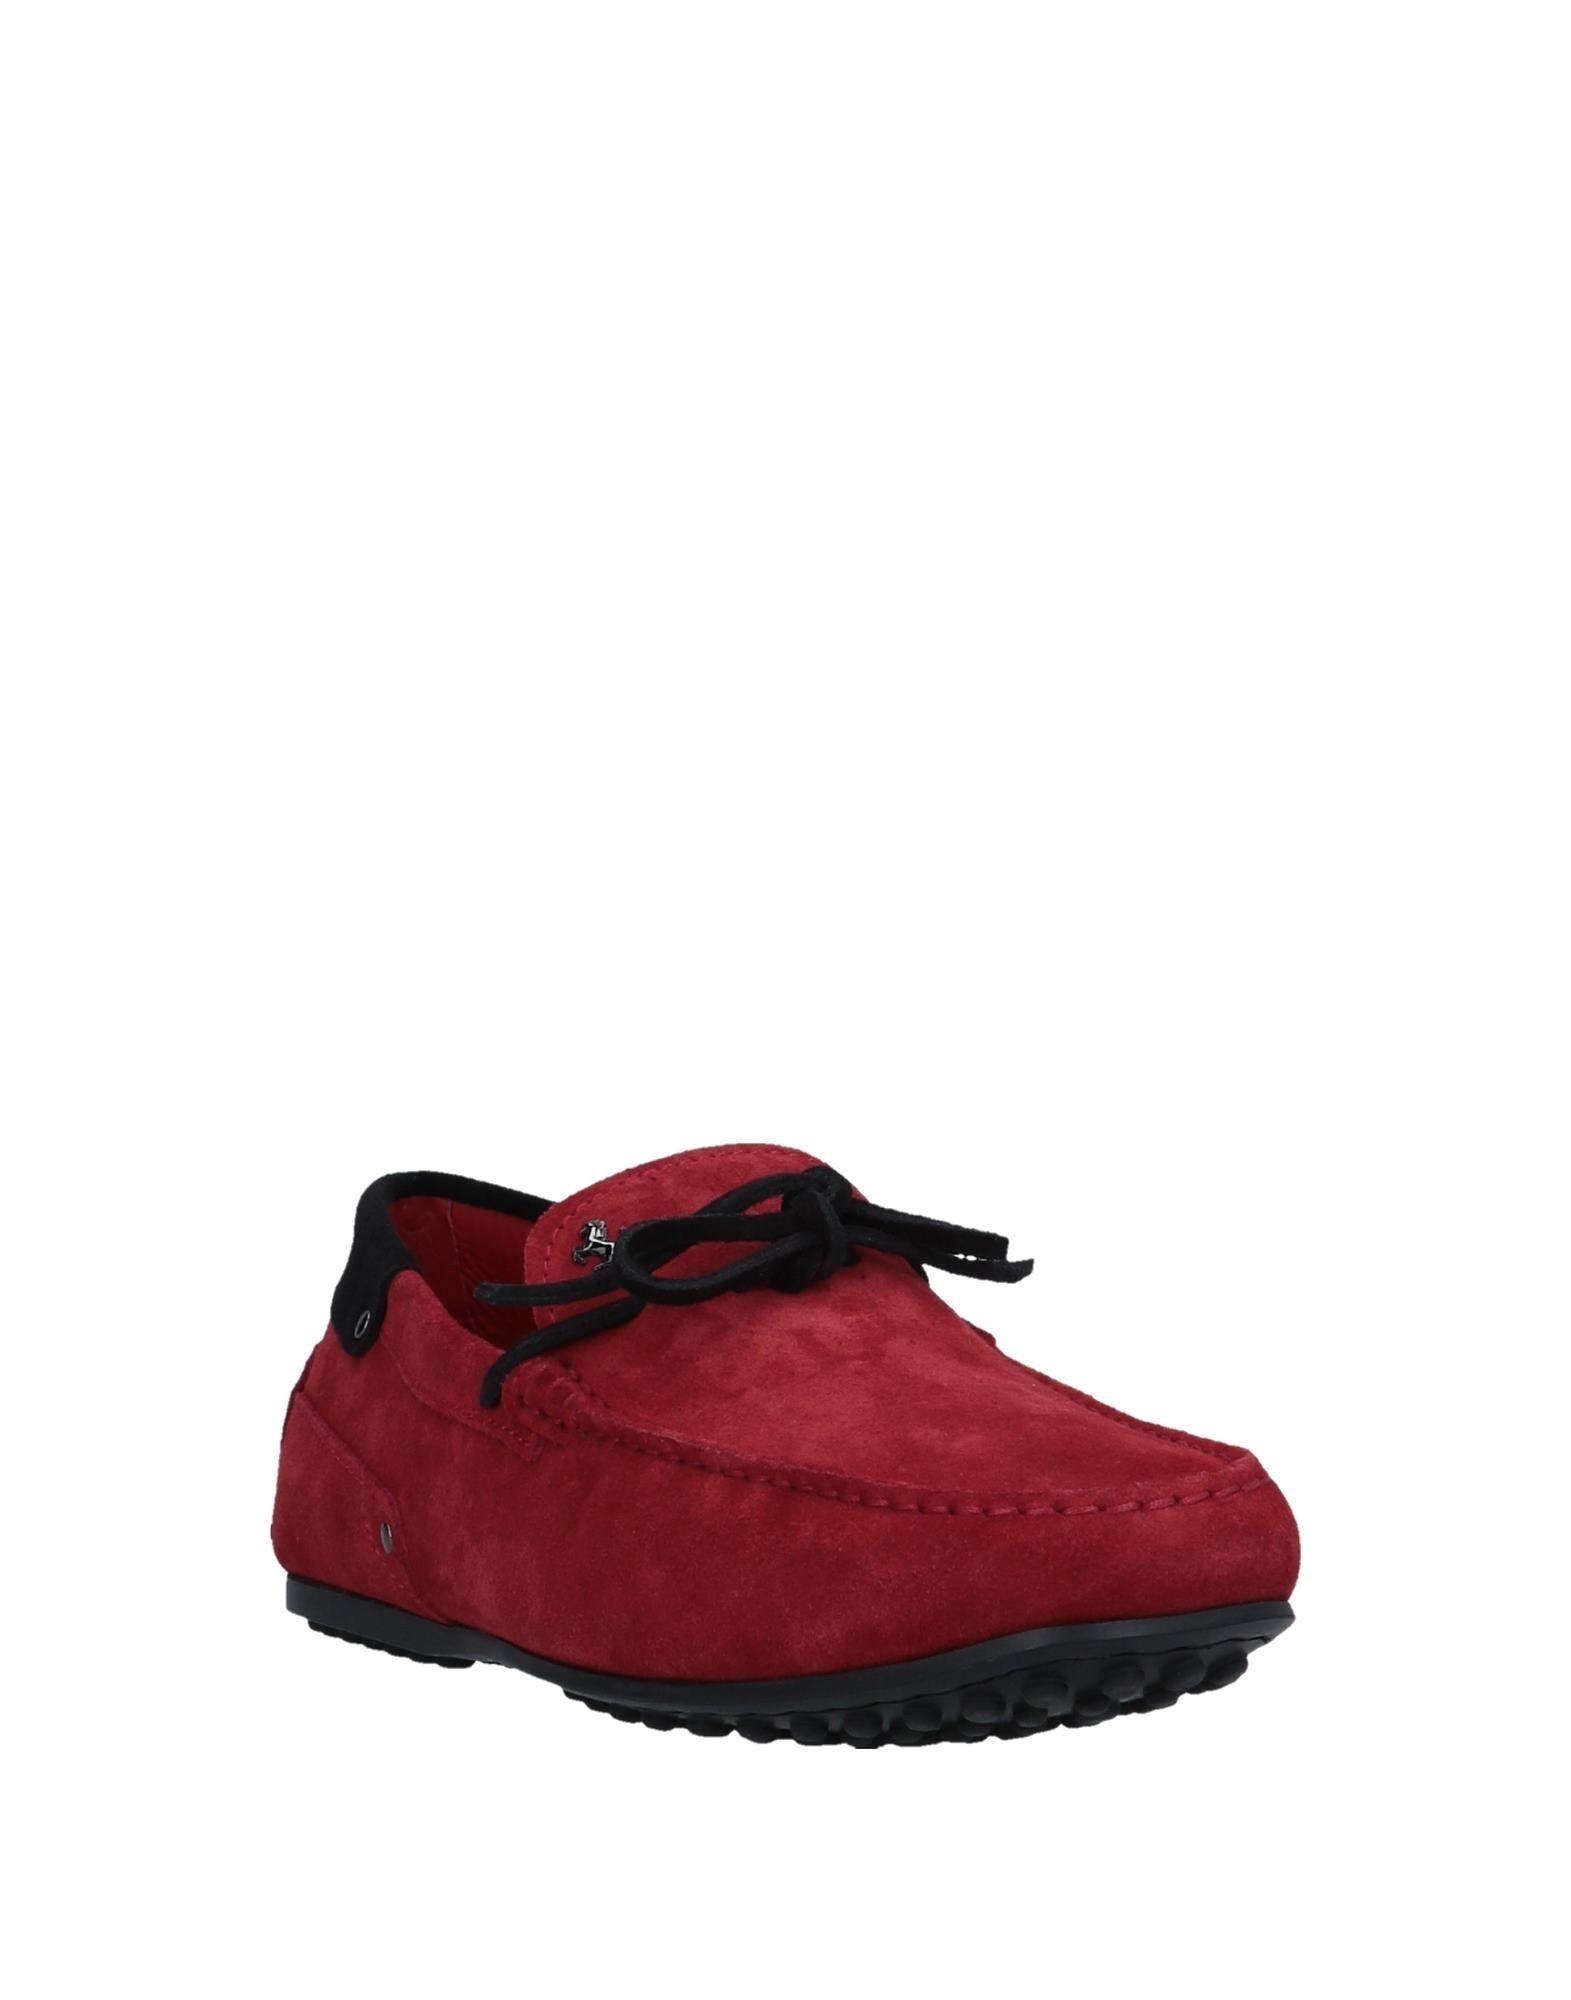 Tod's Mokassins Herren  11541533QK Gute Qualität beliebte Schuhe